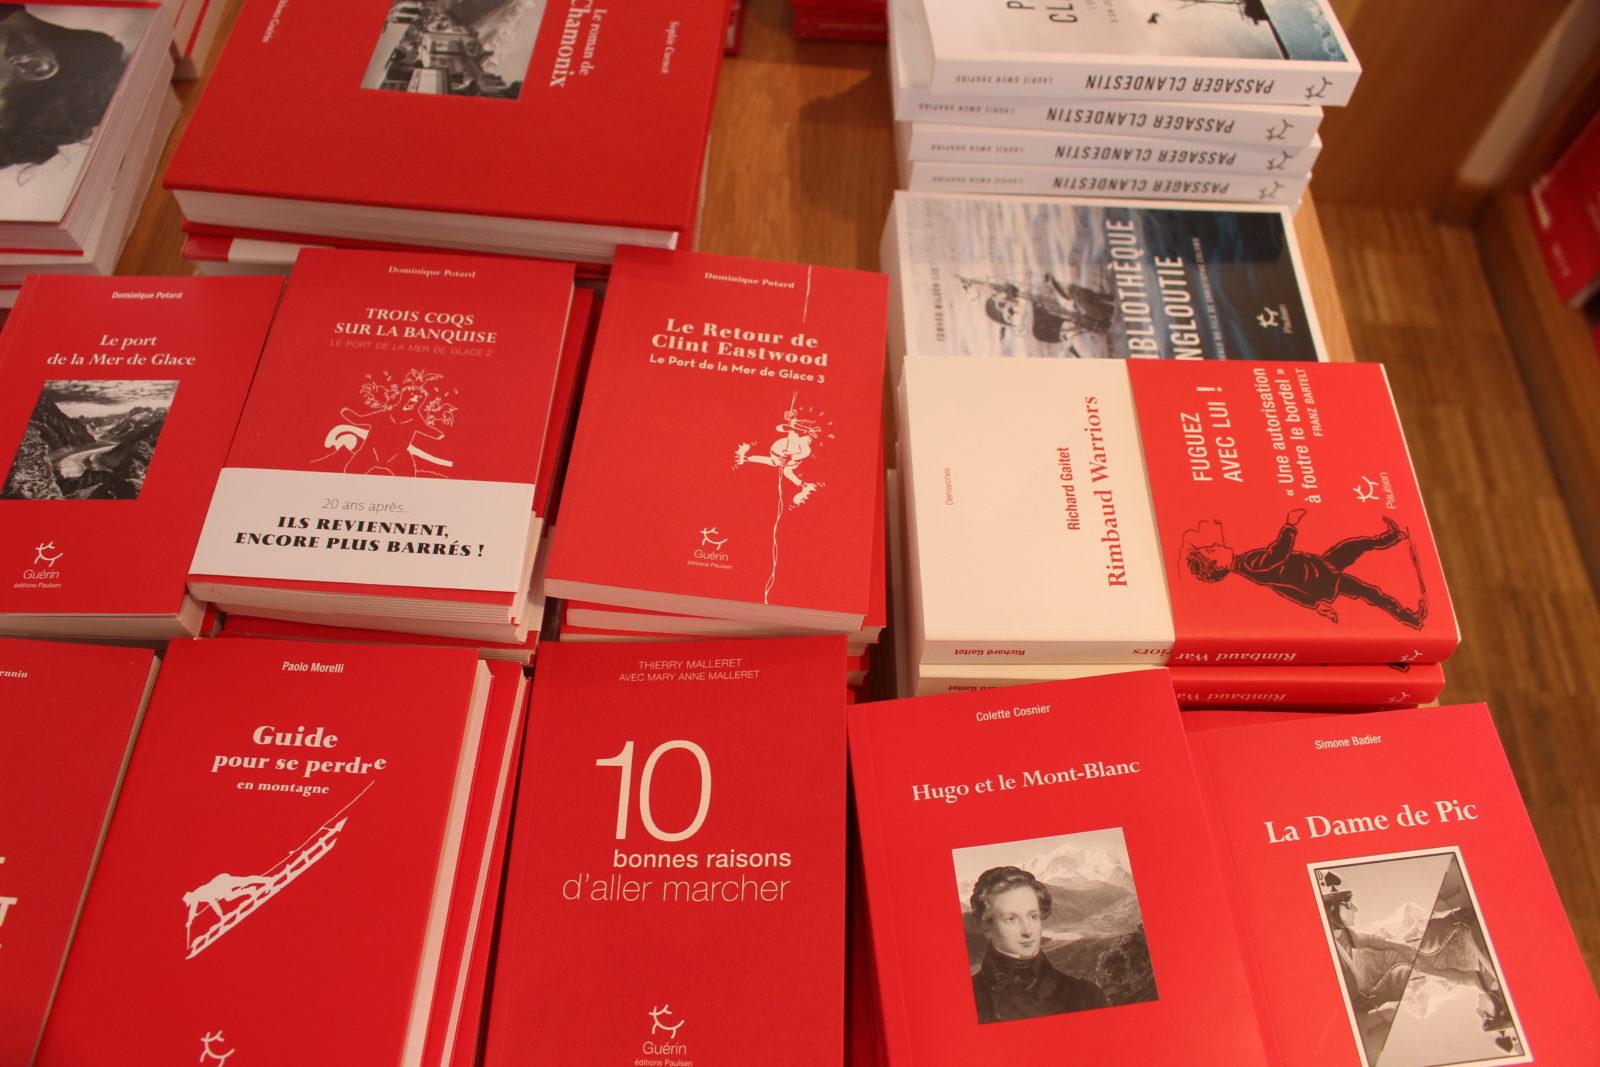 Chamonix livres rouges Guérin